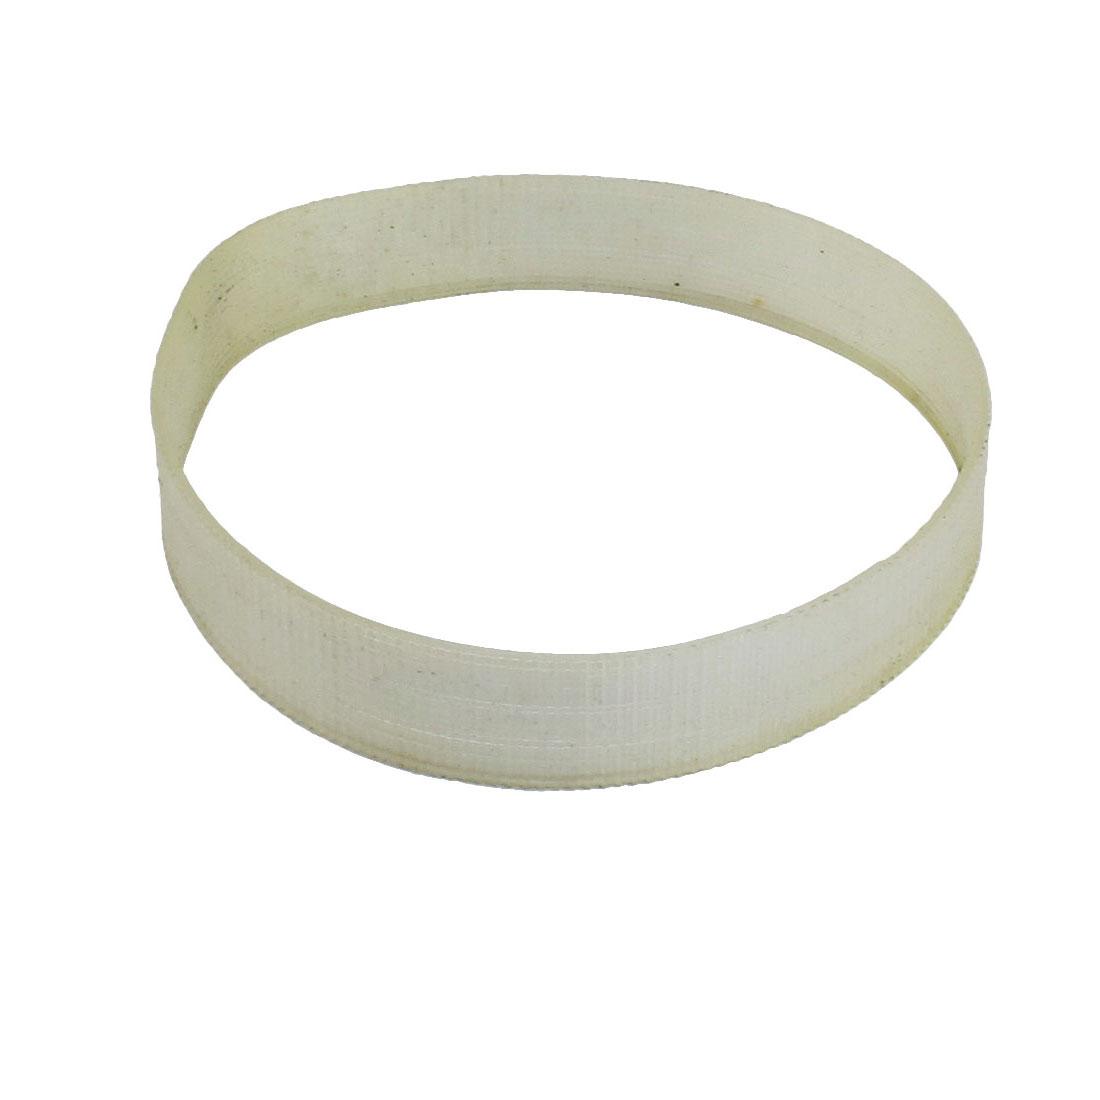 Beige Soft Plastic Repairing Component Cutting Machine Drive Belt